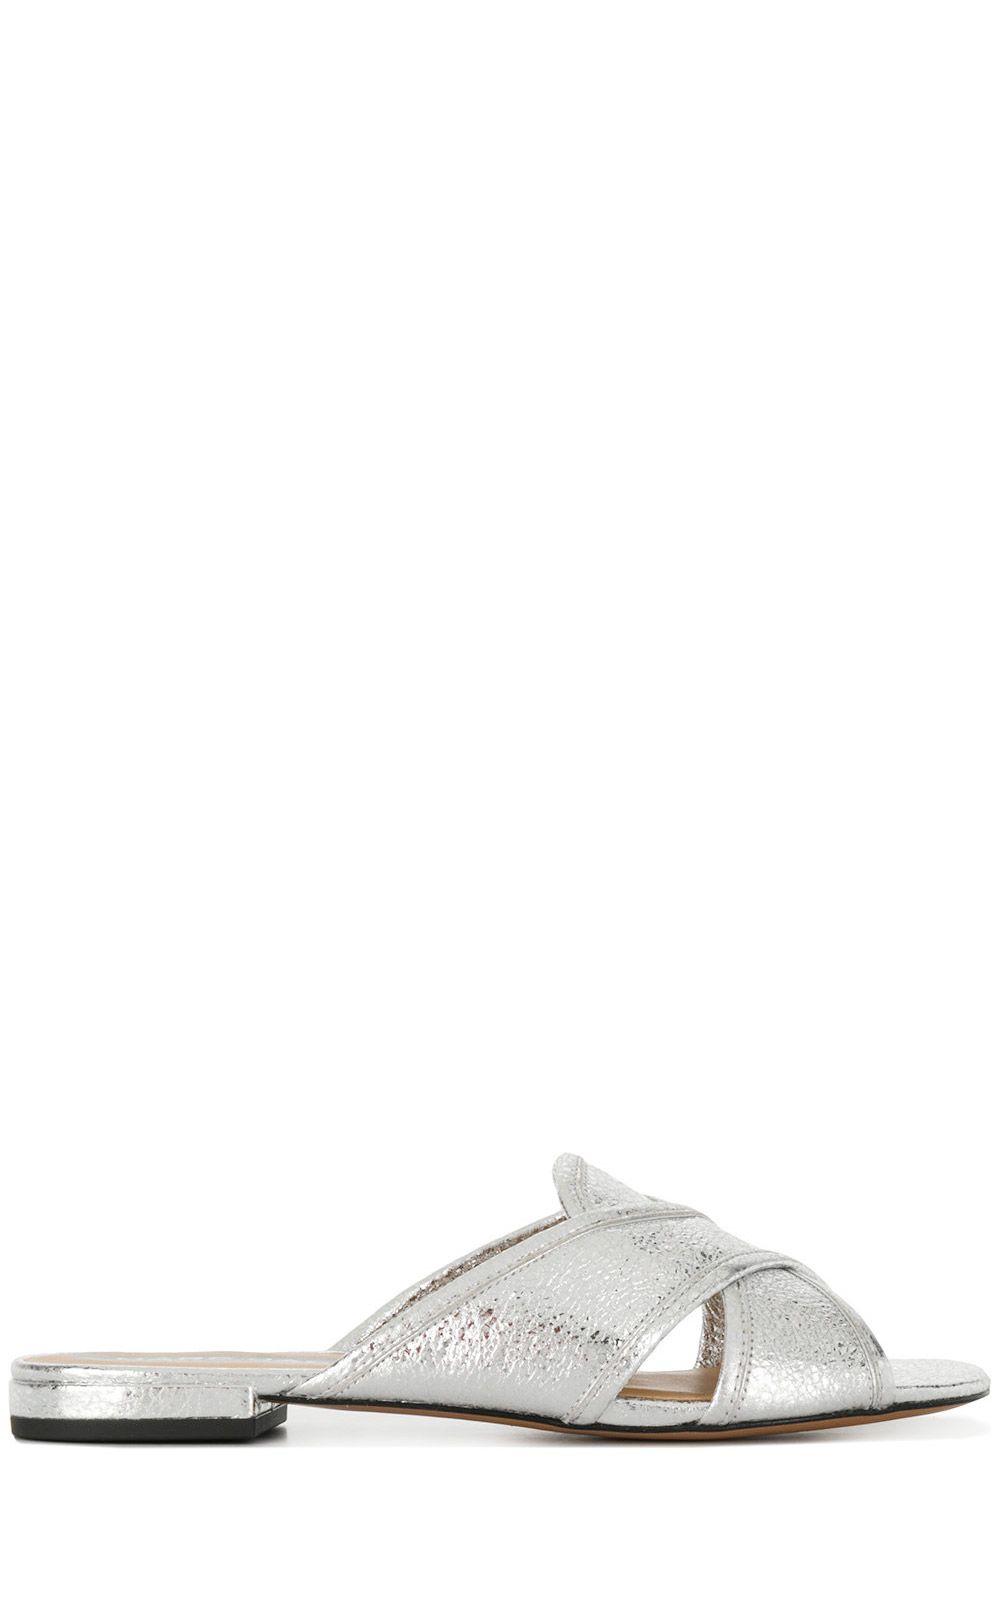 Aurora crackled metallic-leather flat sandals Marc Jacobs 2zVx7Z